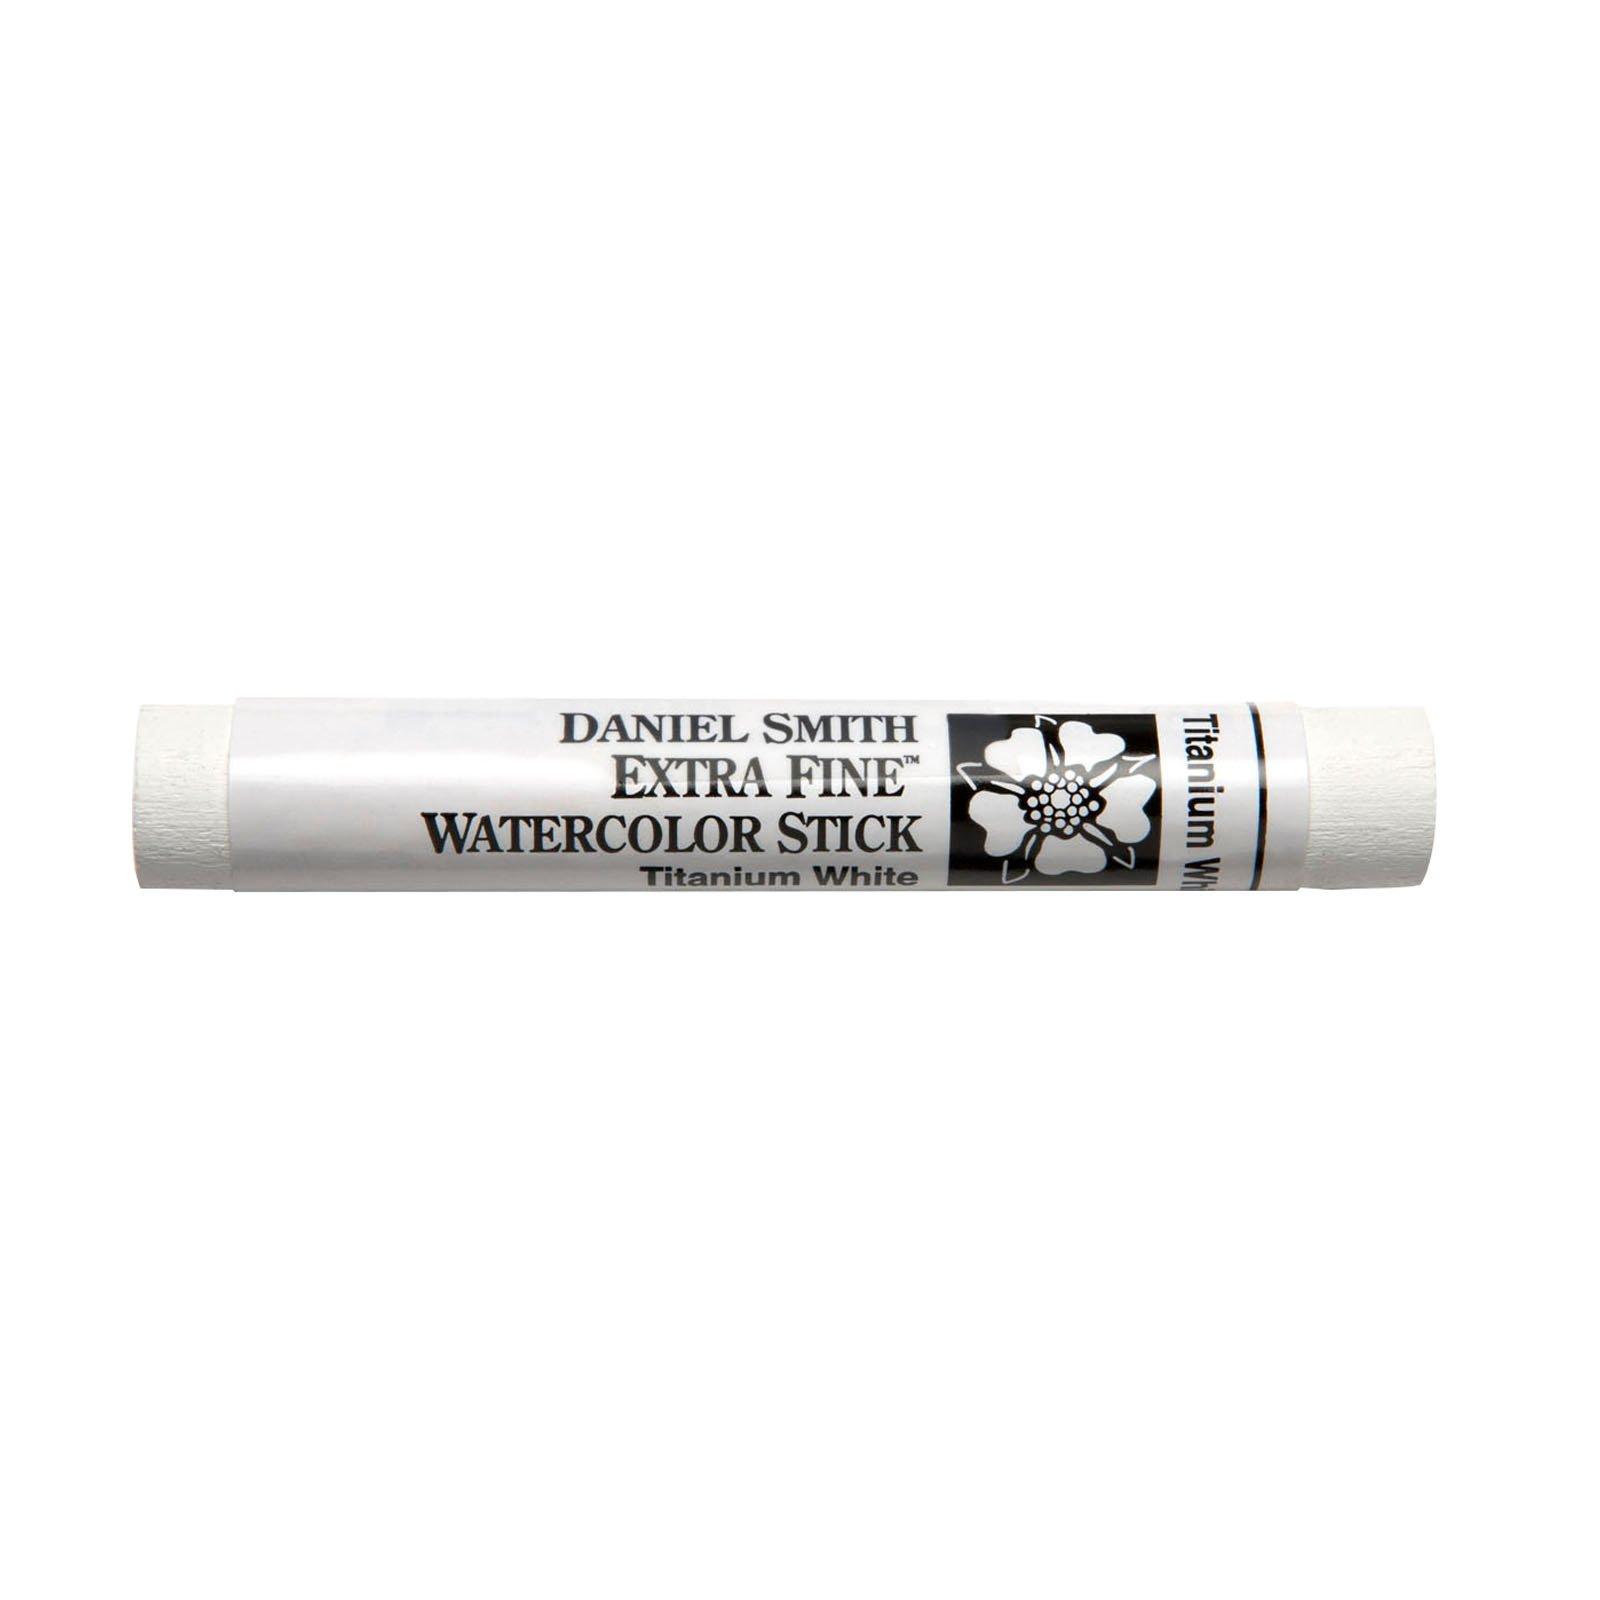 Extra-Fine Watercolor Sticks, Titanium White - 12ml Stick